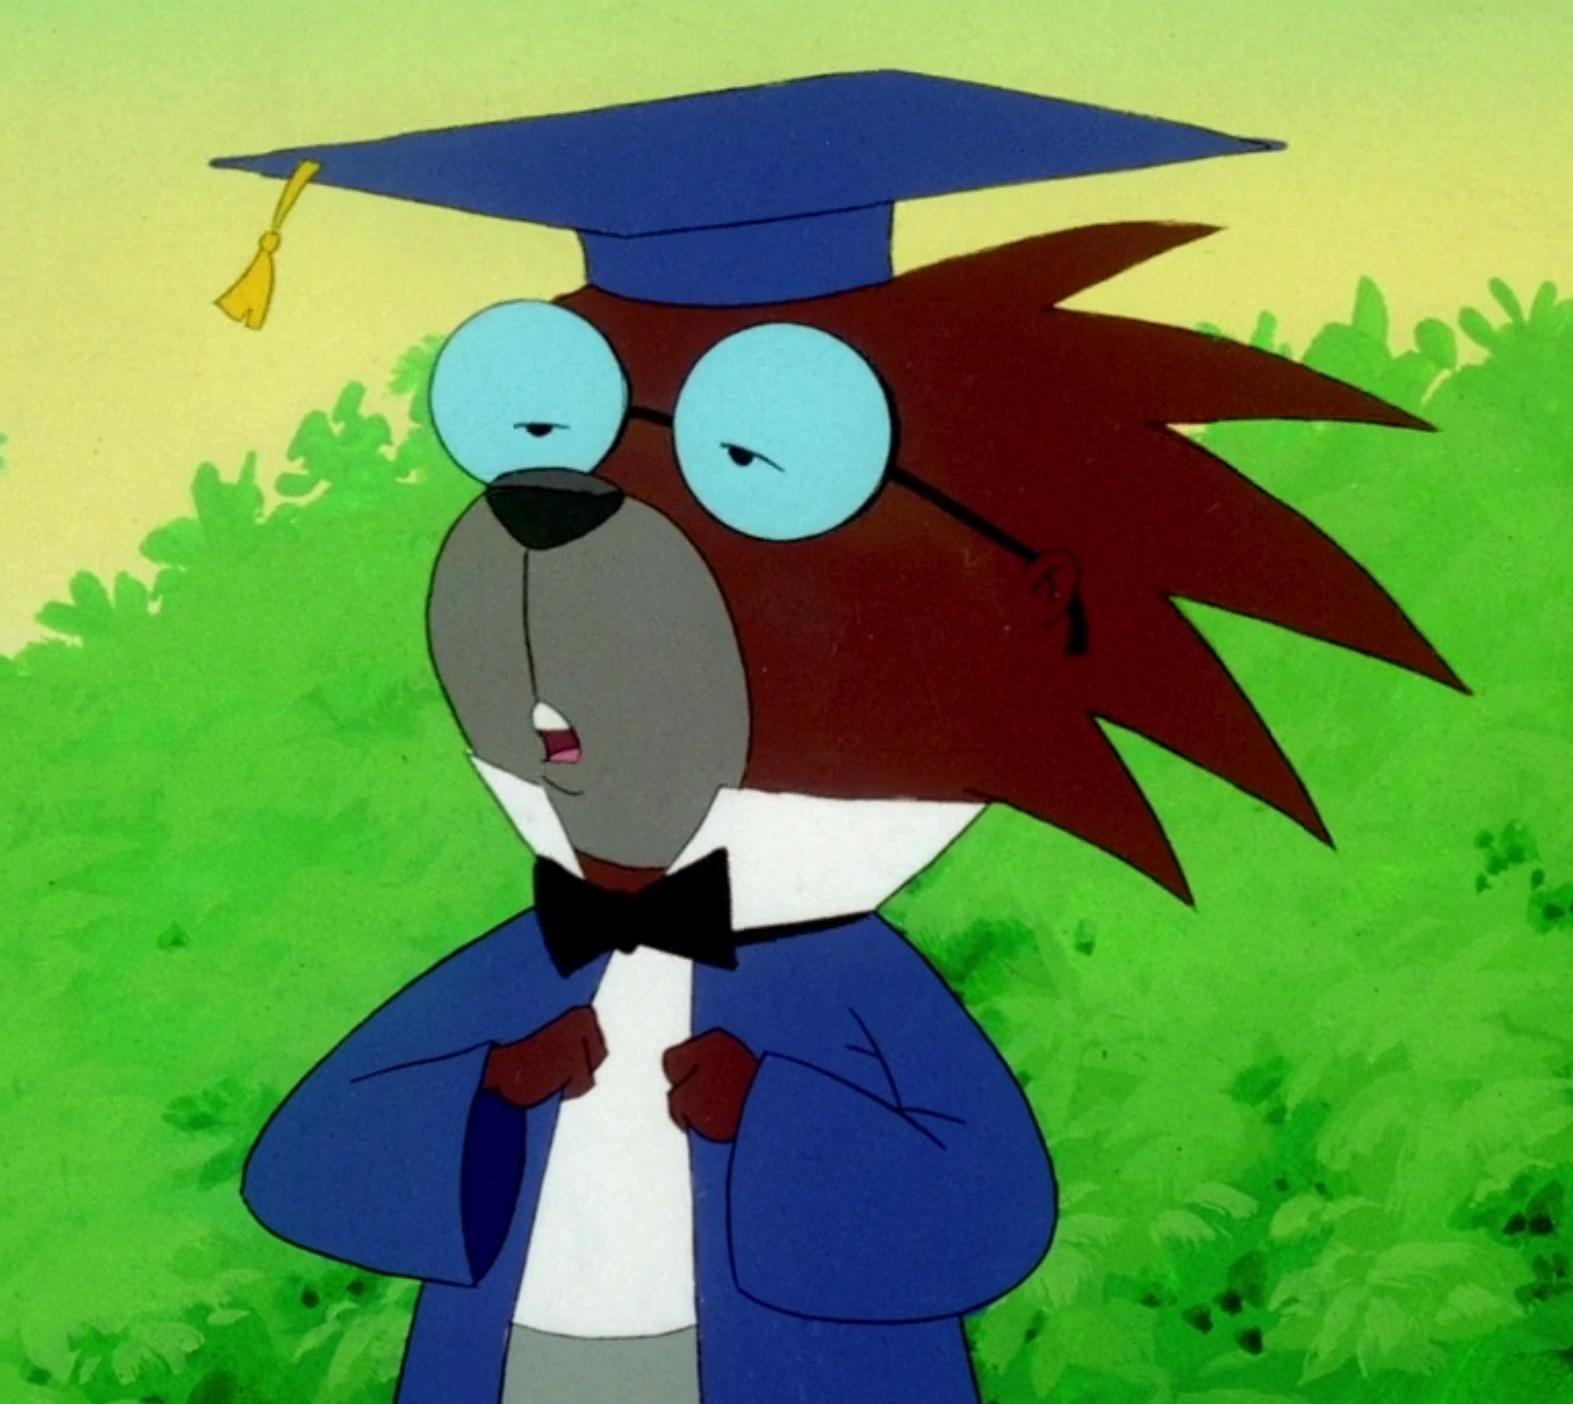 Dr. Exceter